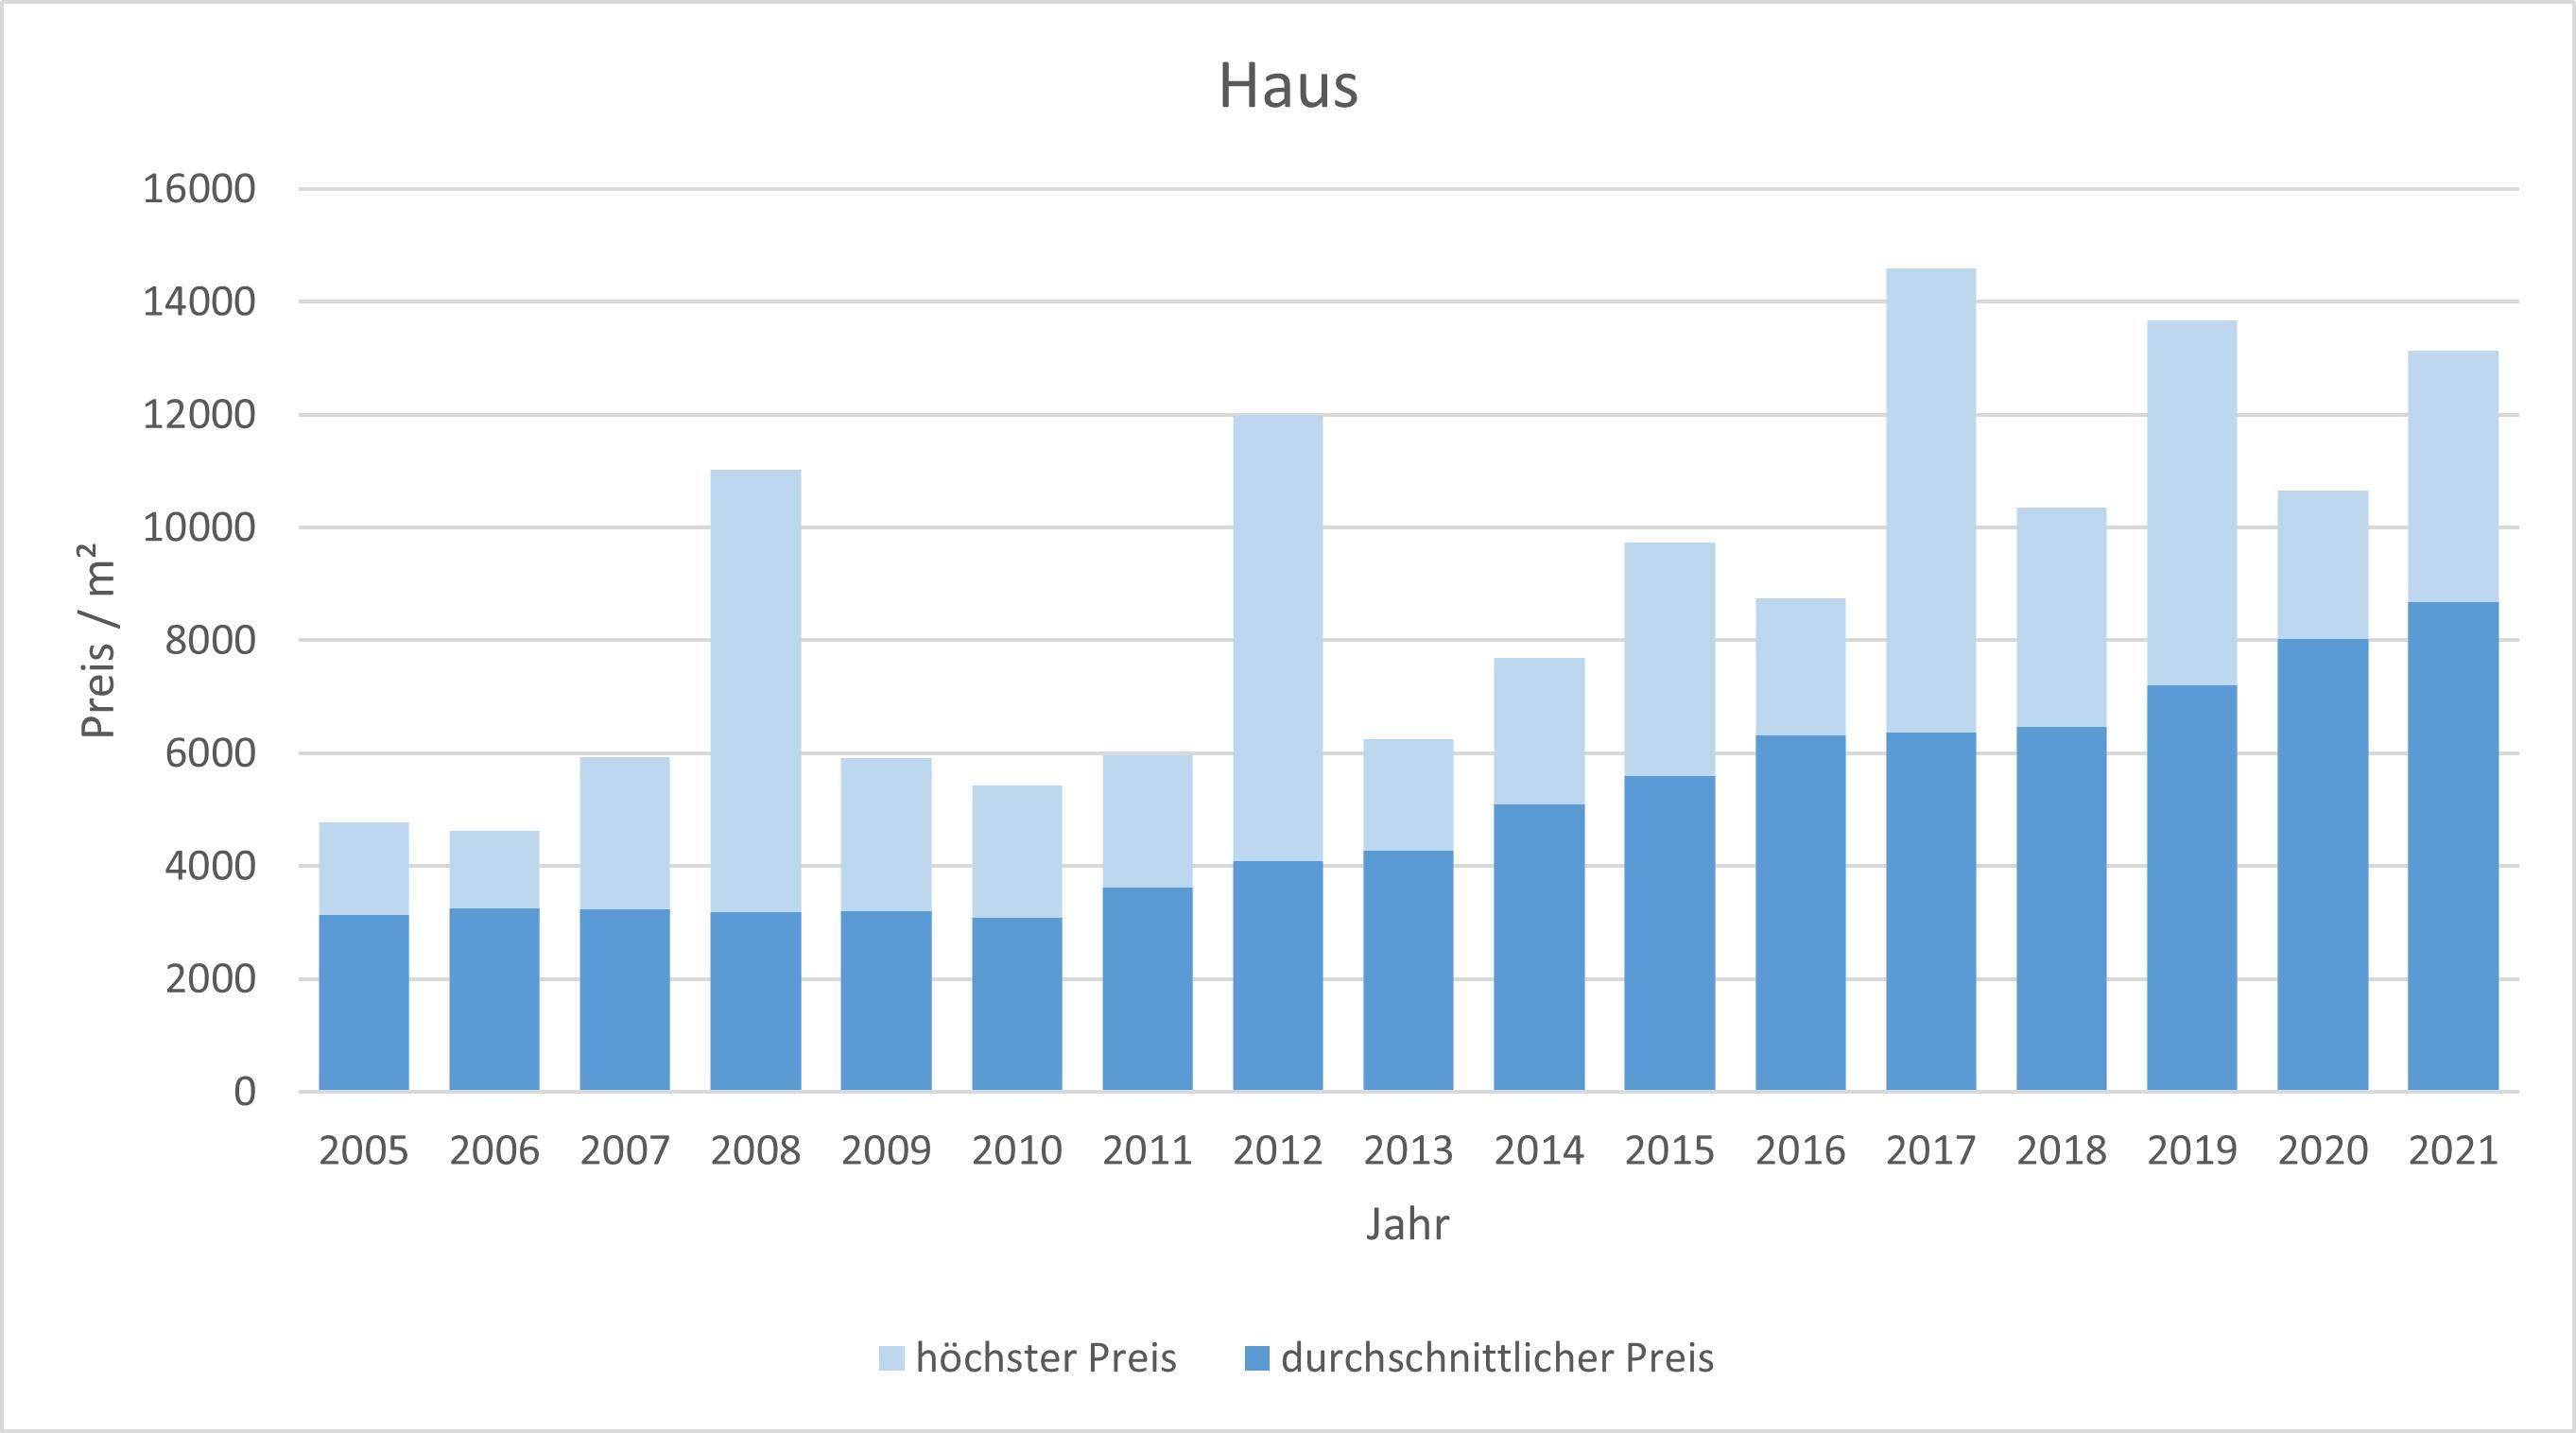 Haar Haus kaufen verkaufen Preis Bewertung Makler www.happy-immo.de 2019 2020 2021